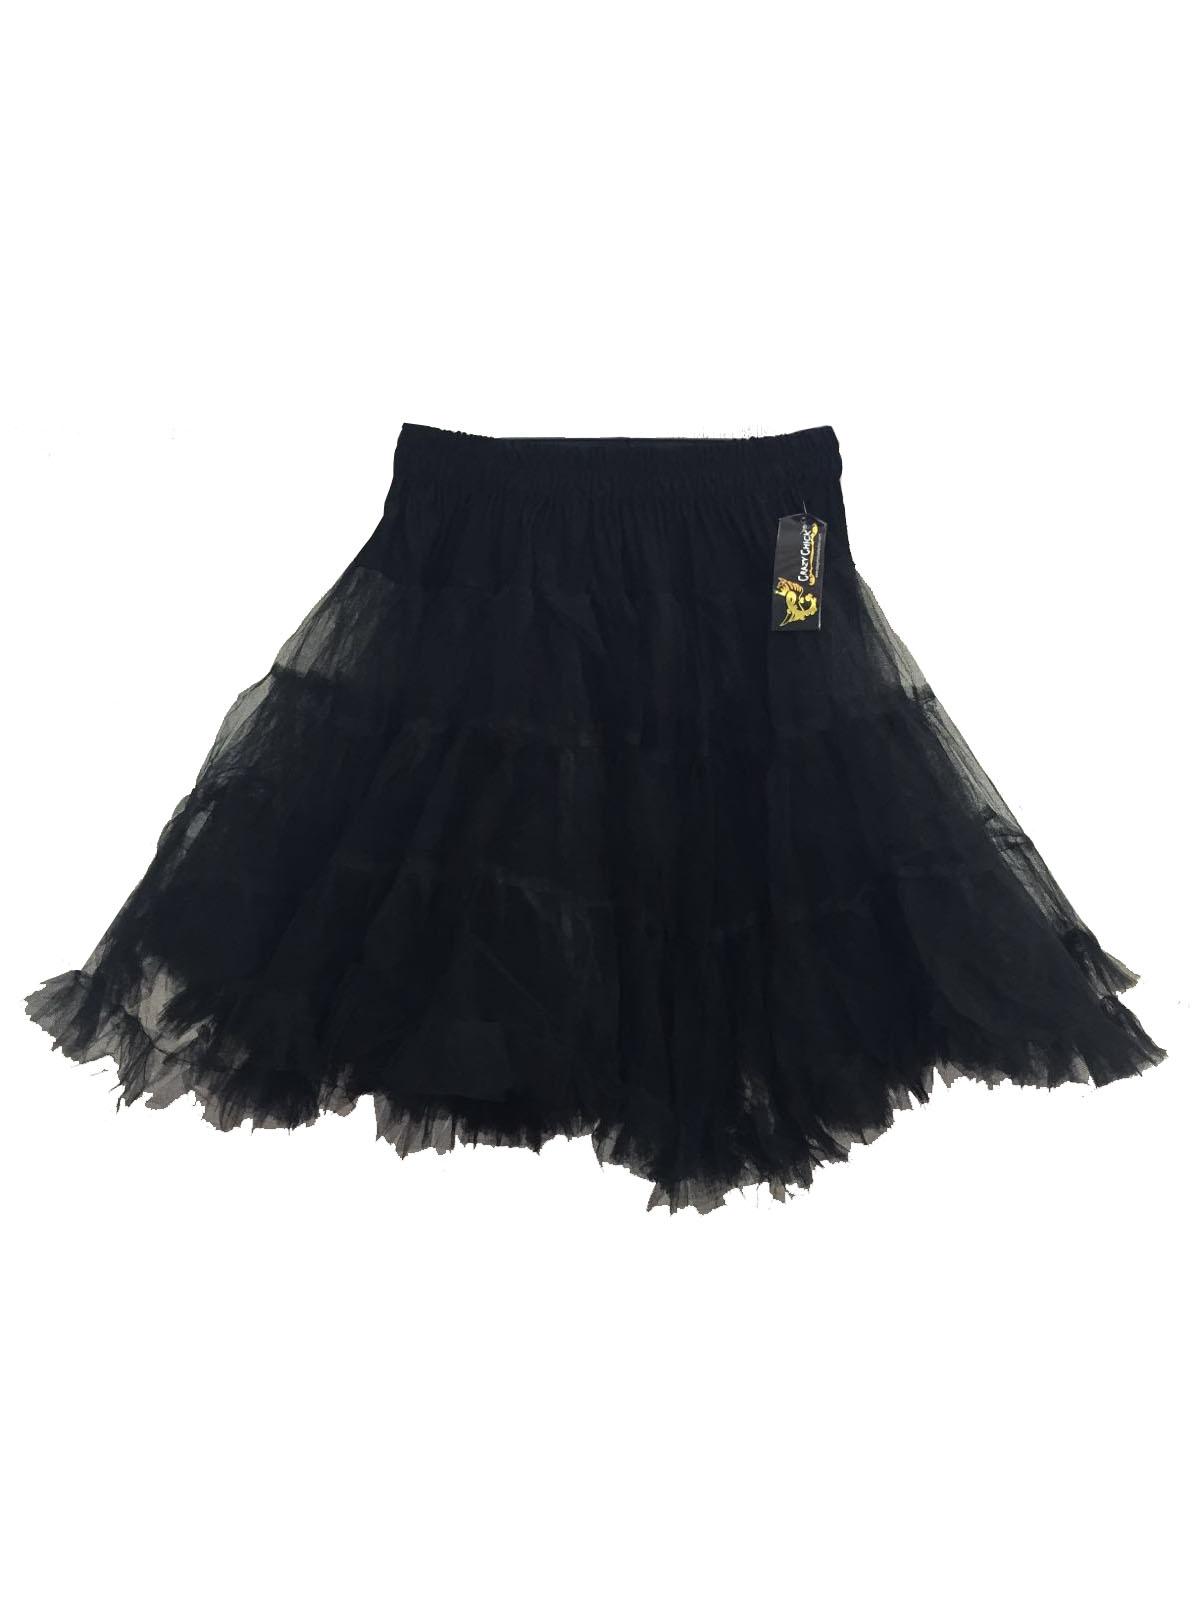 Crazy Chick Black Dance Ruffle Petticoat skirt (18 Inches Long)